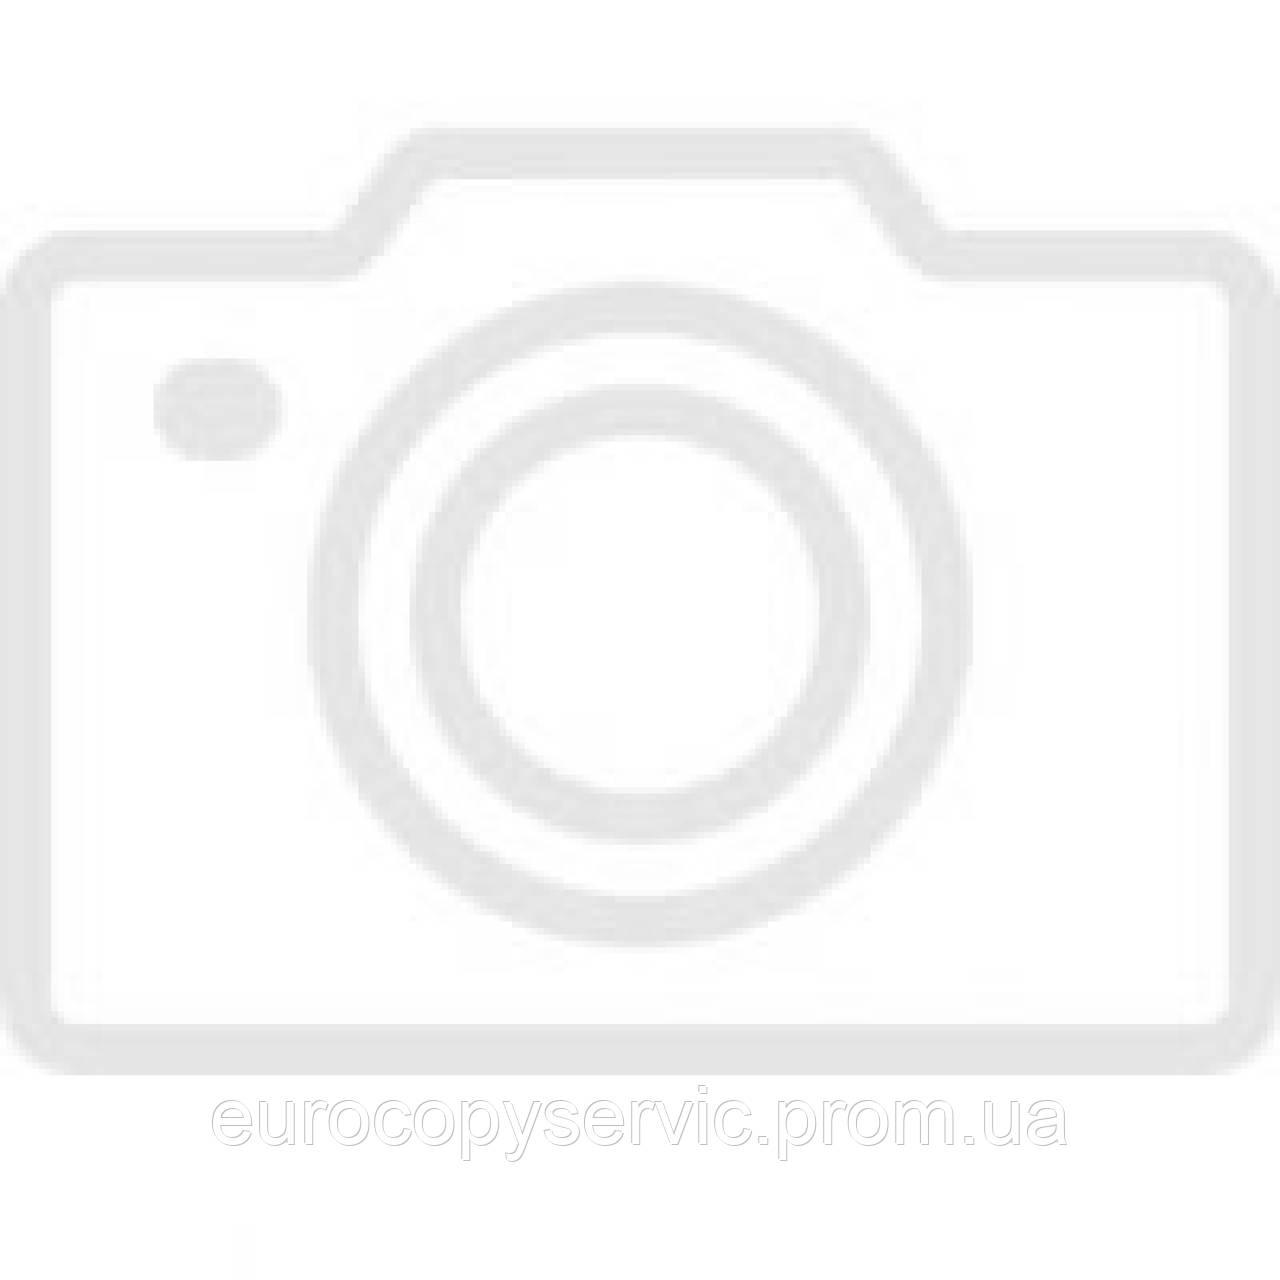 Плата форматирования Canon LBP-810 (имеет USB выход, не подходит LJ 1100) (RG1-4087-000000) OEM